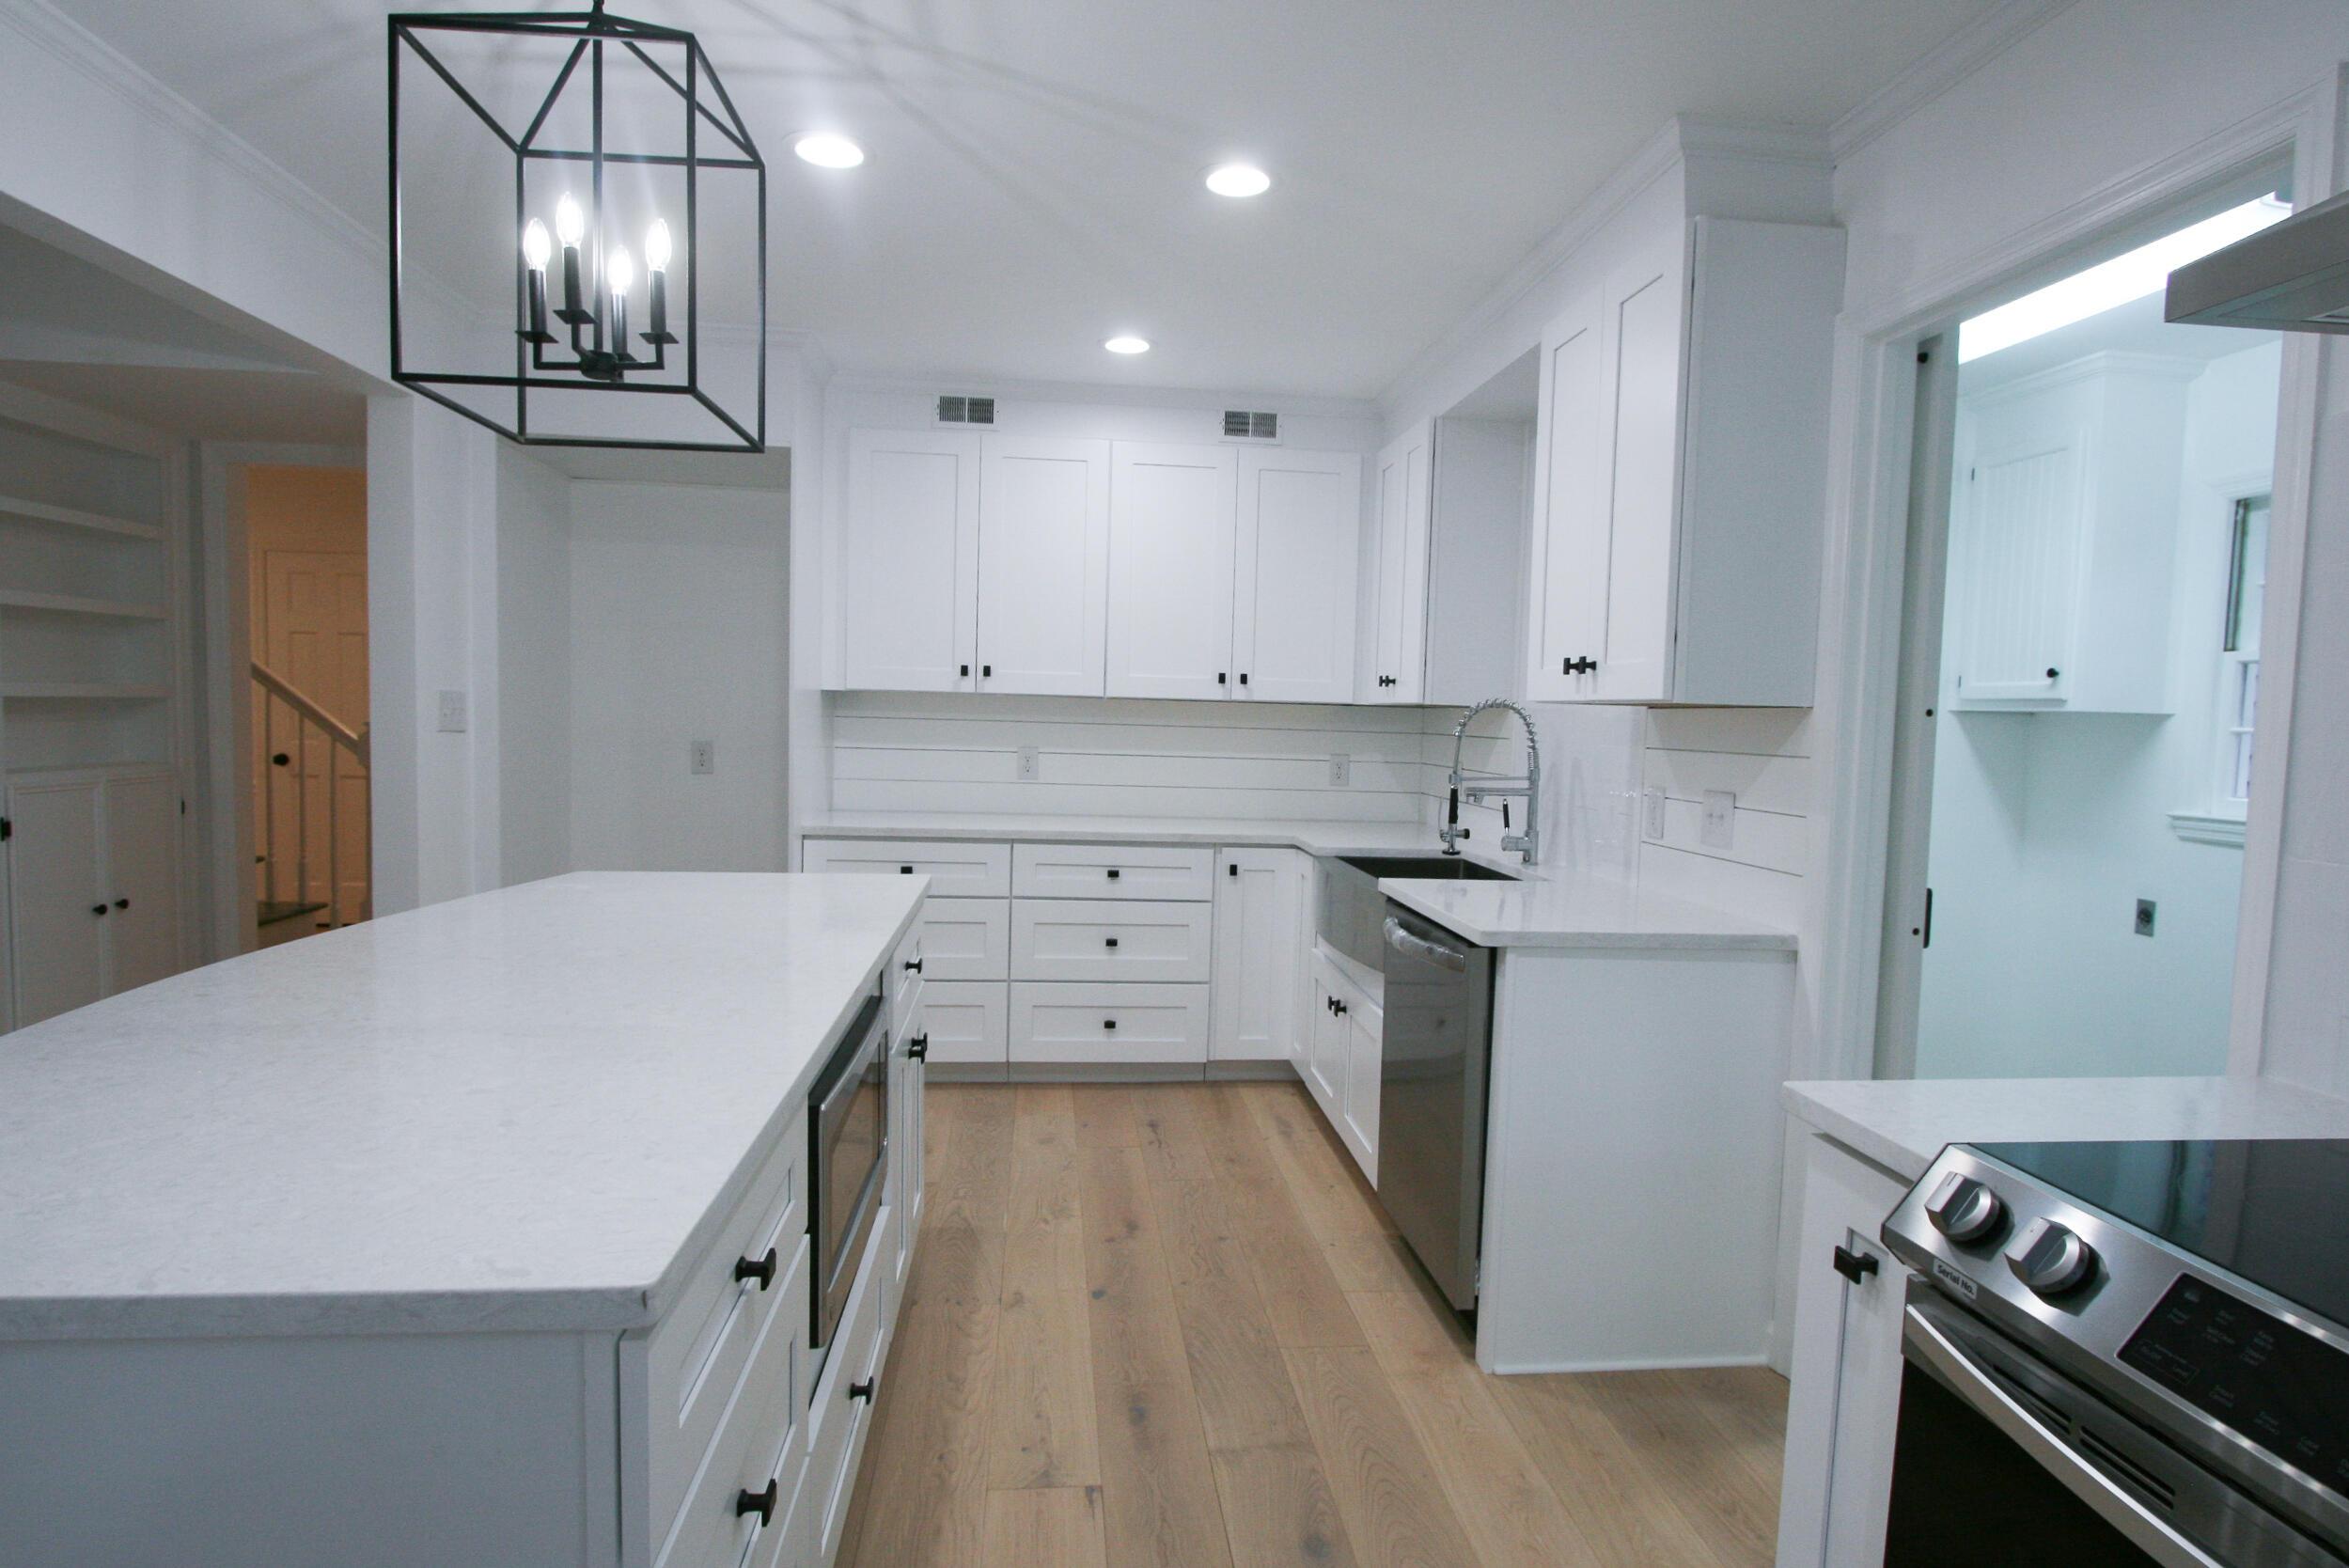 1071 Ambassador Way, Mount Pleasant, 29464, 4 Bedrooms Bedrooms, ,2 BathroomsBathrooms,Residential,For Sale,Ambassador,21023974